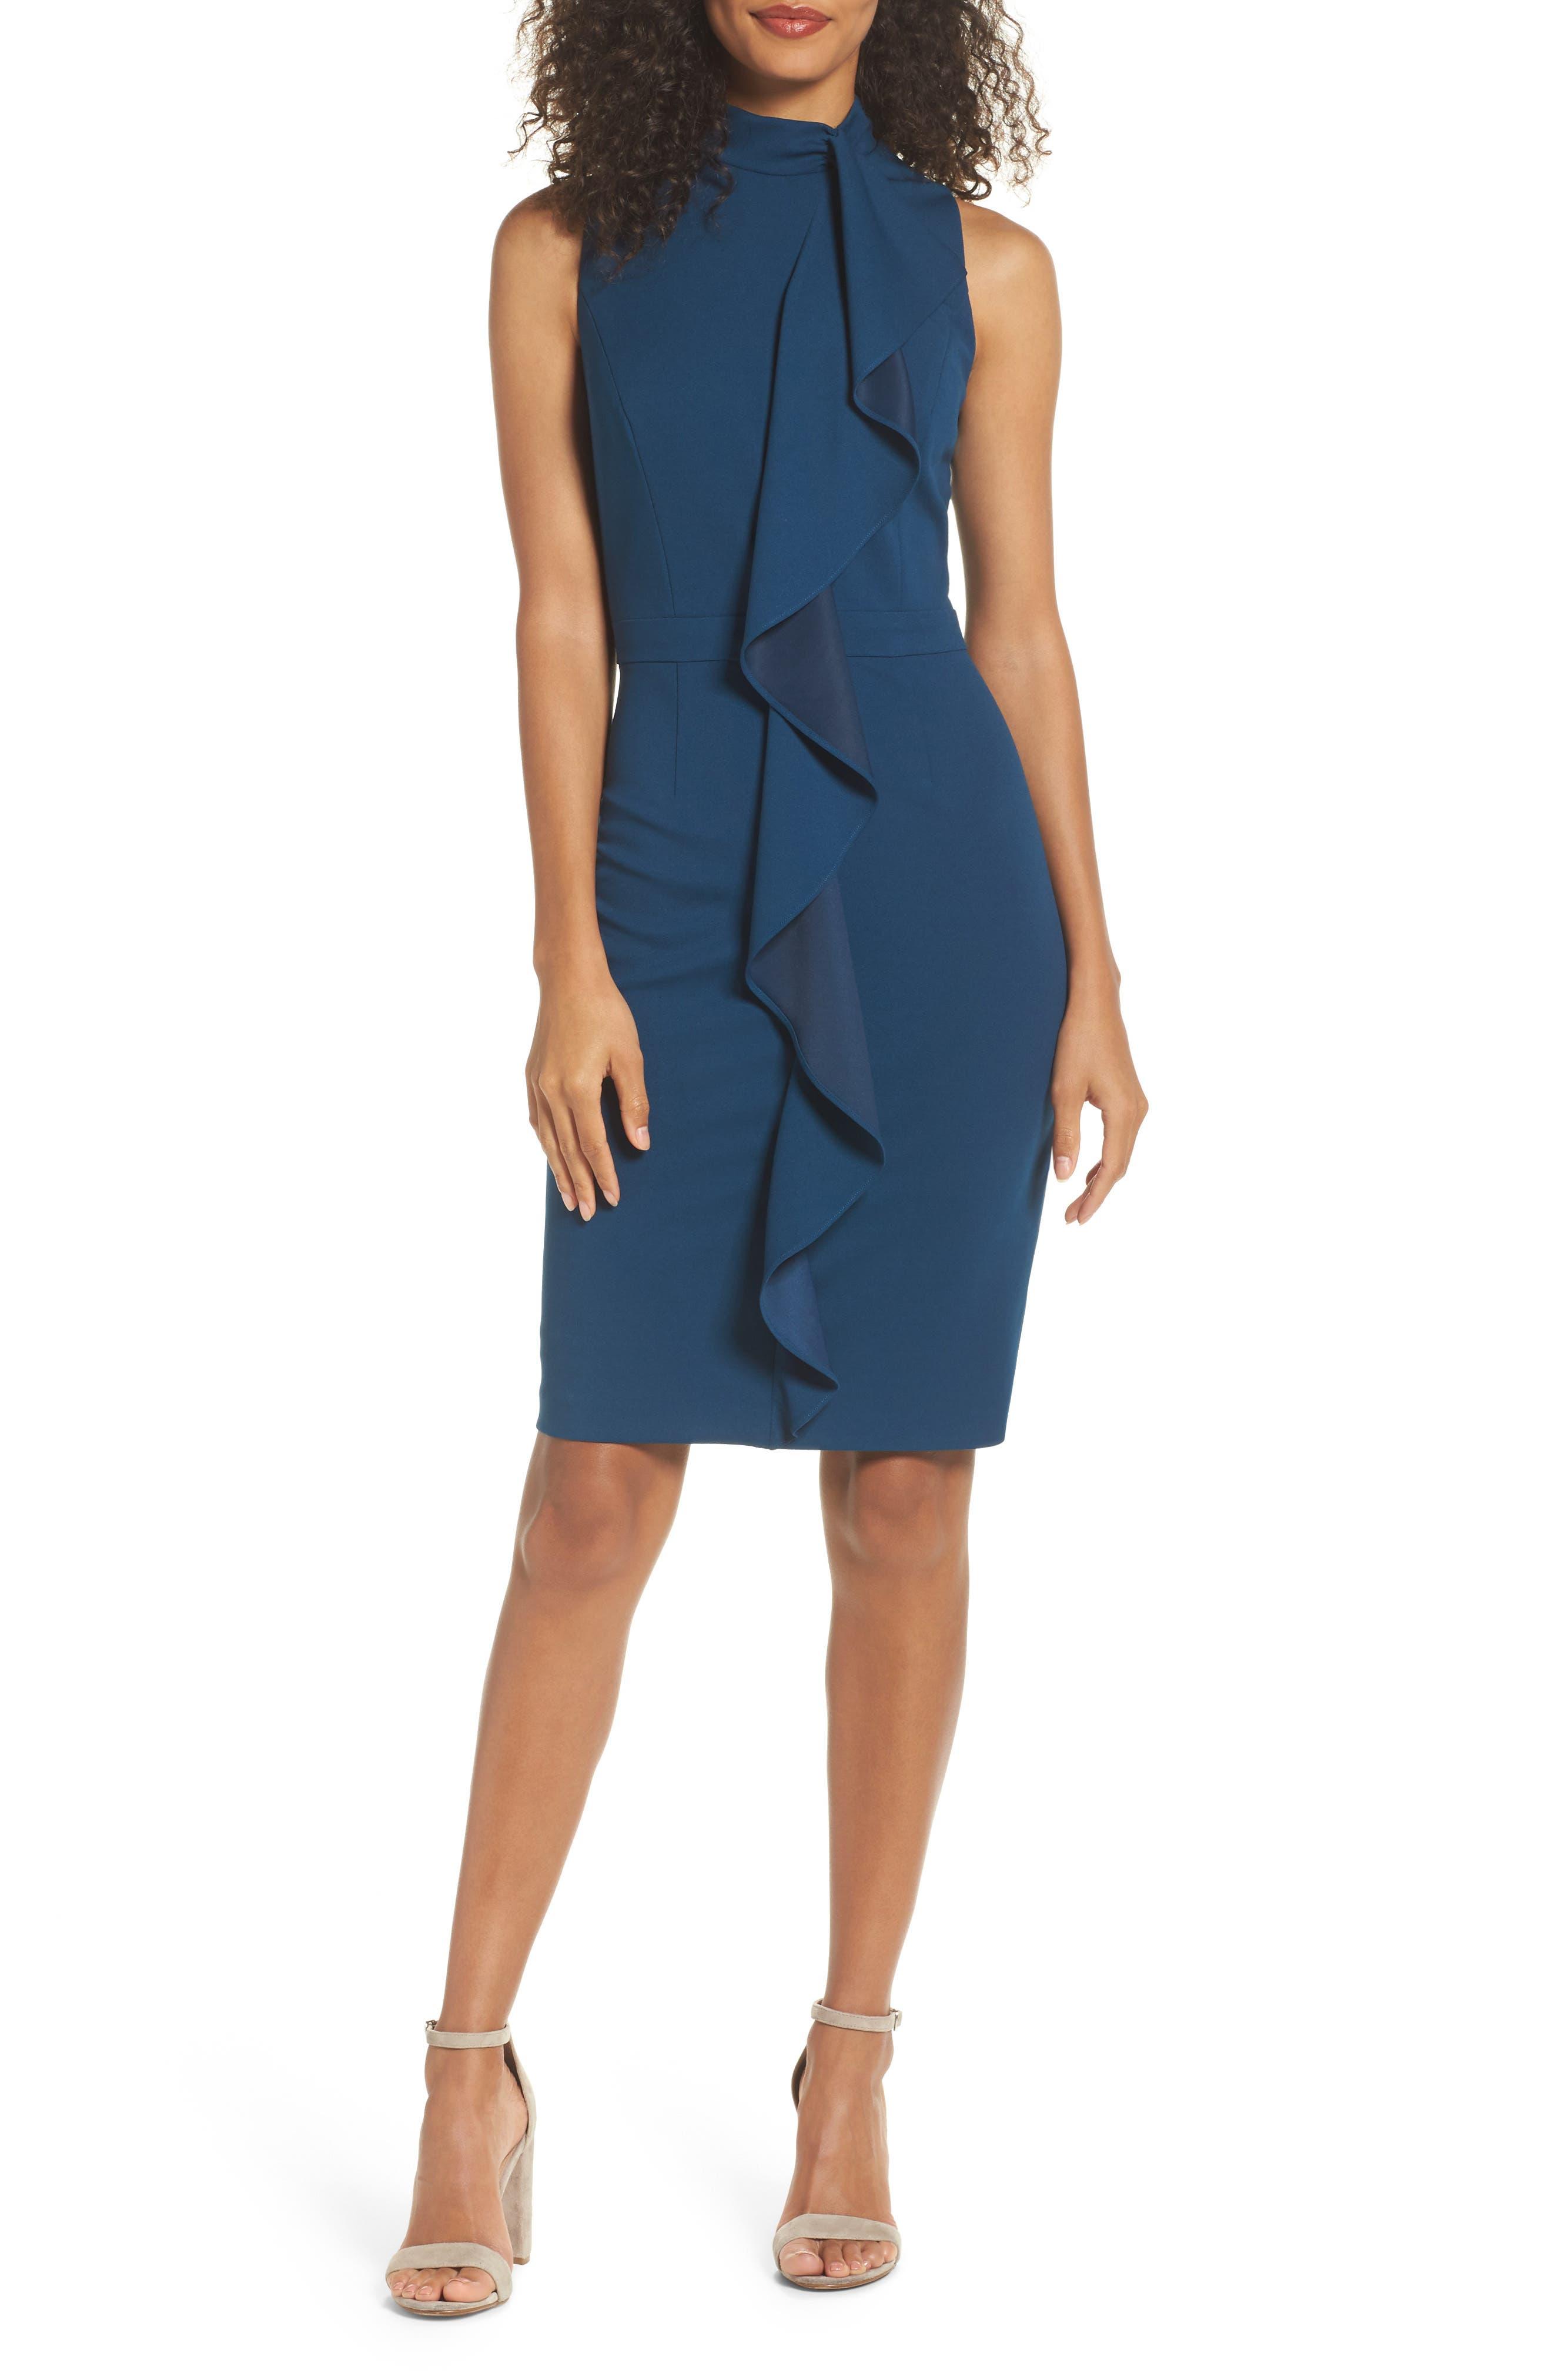 Adrianna Papell Ruffle Sheath Dress (Regular & Petite)